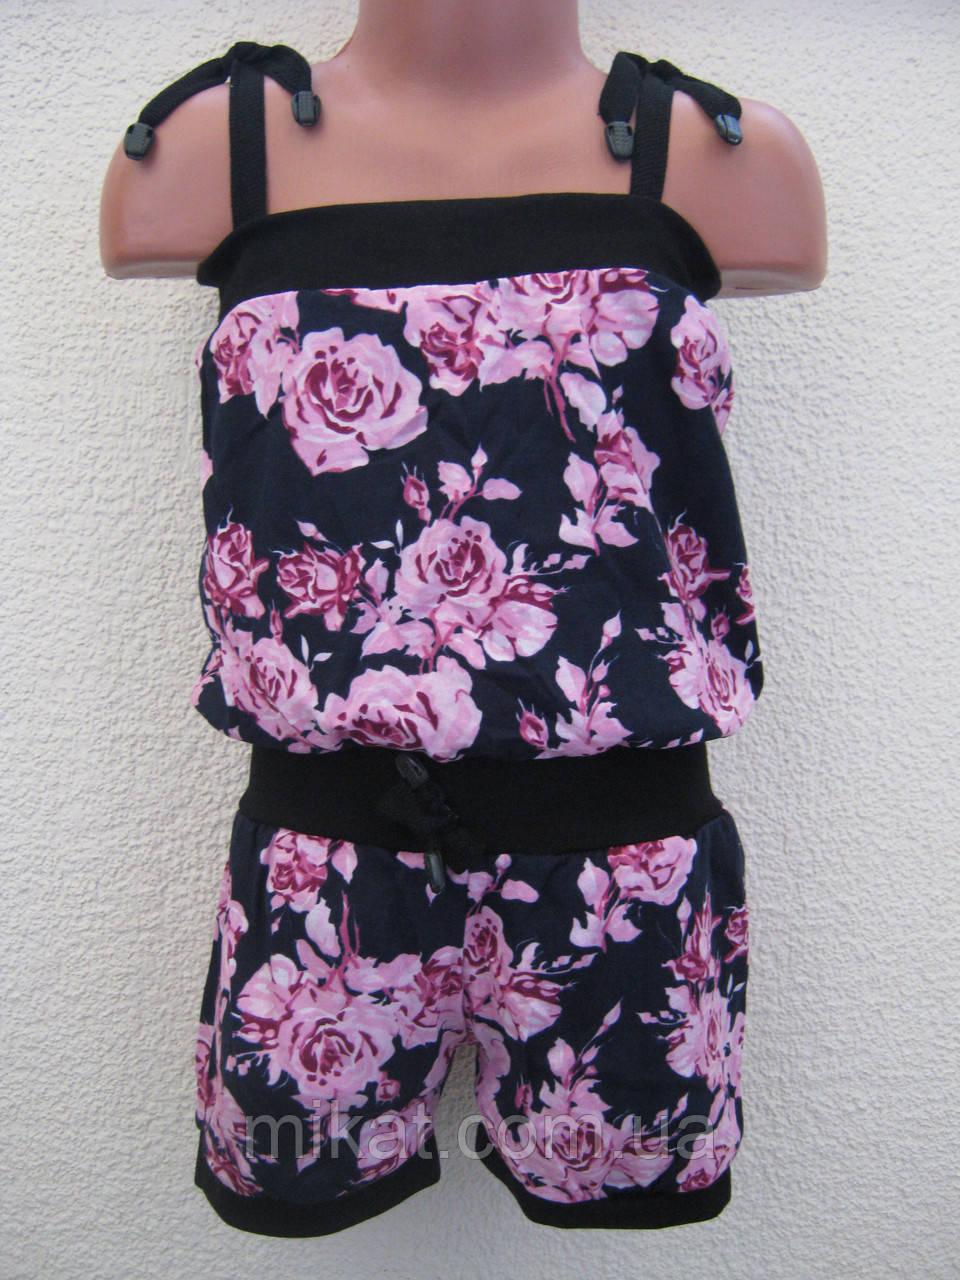 34b4f8940e9a Літній комбінезон (топ + шорти), для дівчинки (1,5-2 роки): продажа ...